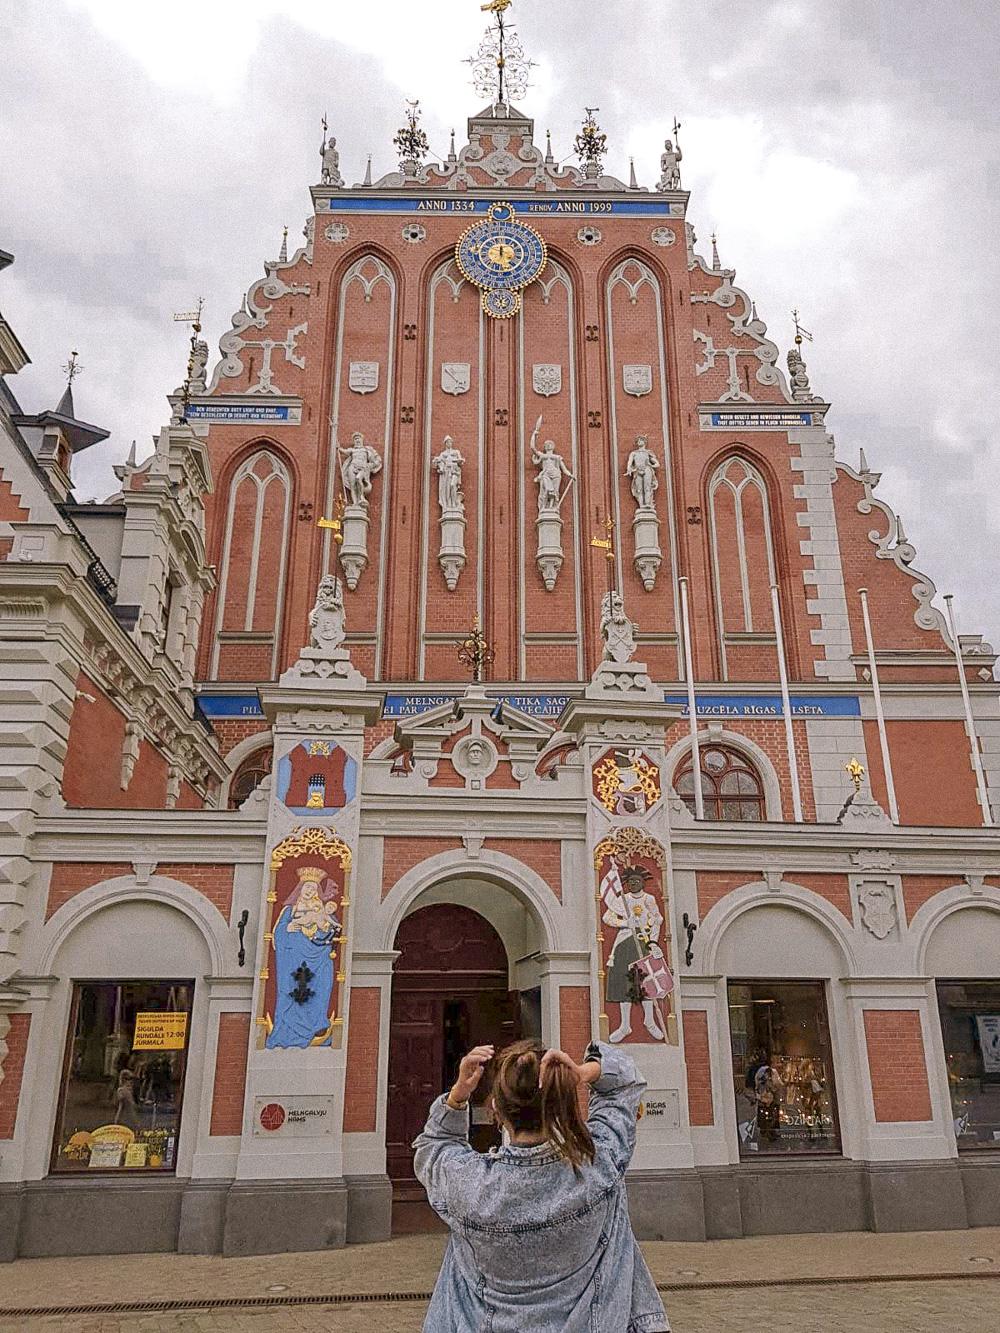 Visit The Bortherhood of the Blackheads in Riga house of the blackheads